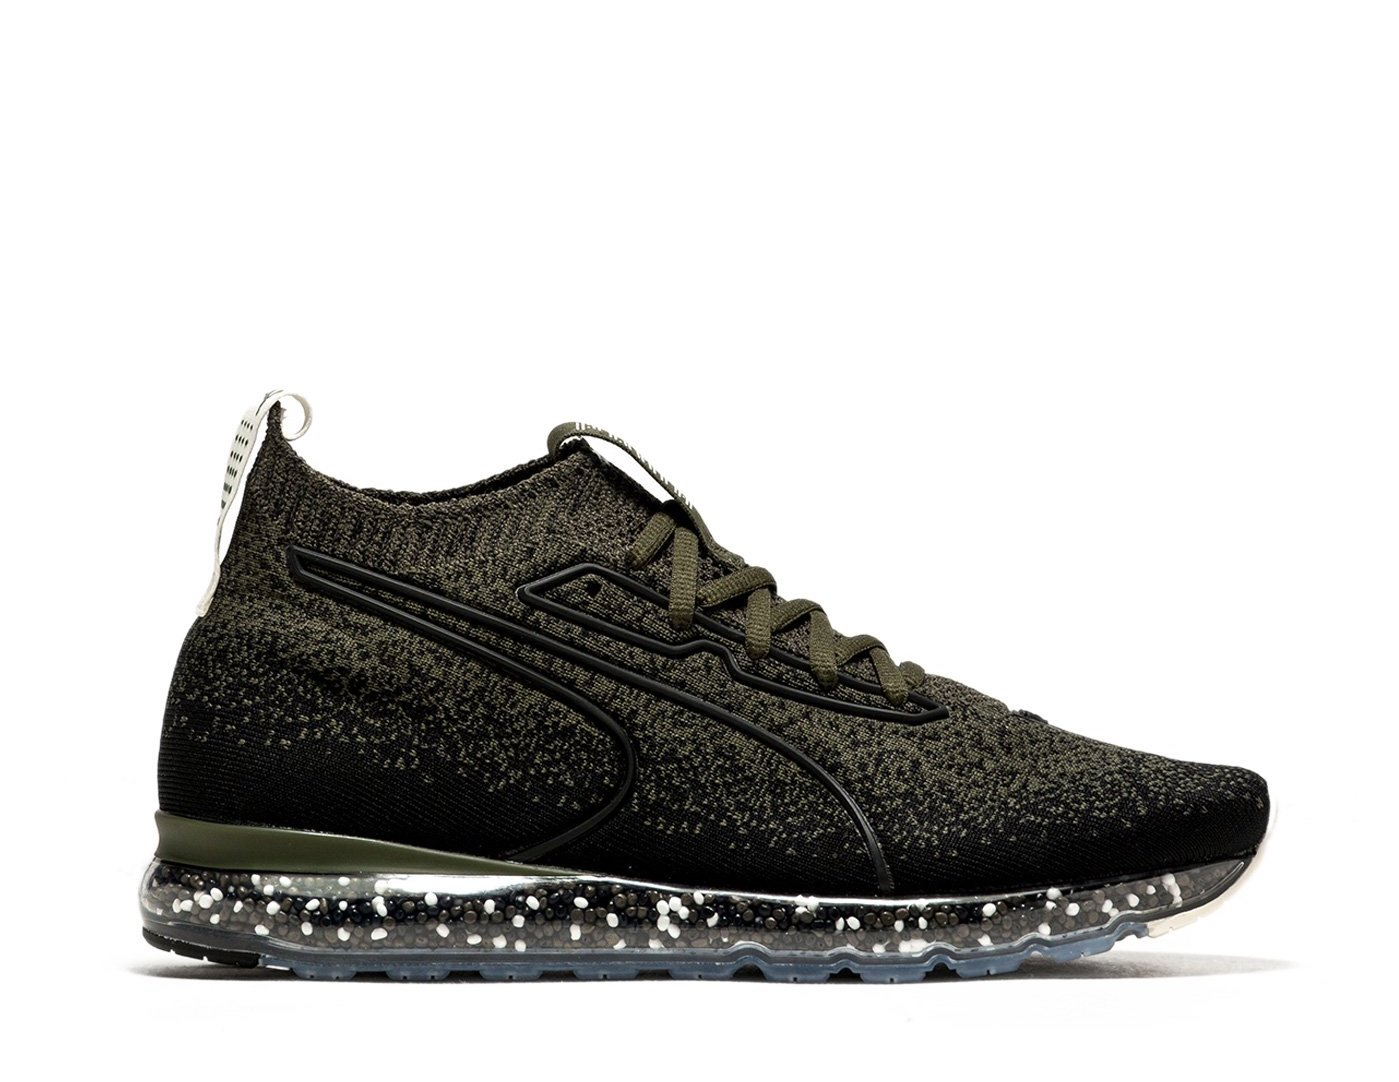 sneaker-uomo-jamming-verde-nero-puma_4100